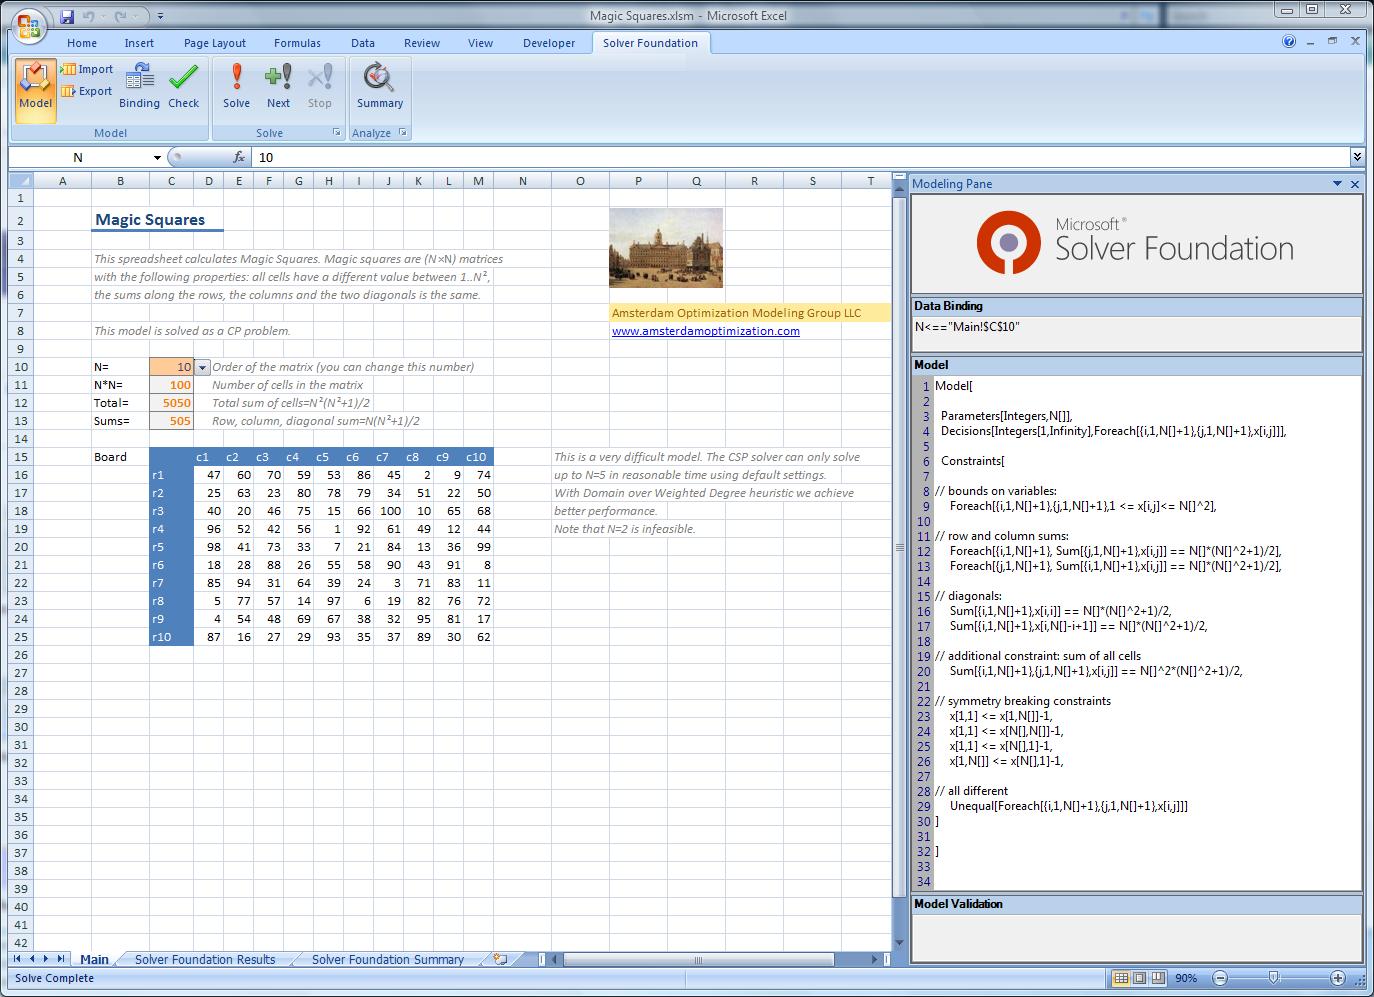 Microsoft Solver Foundation